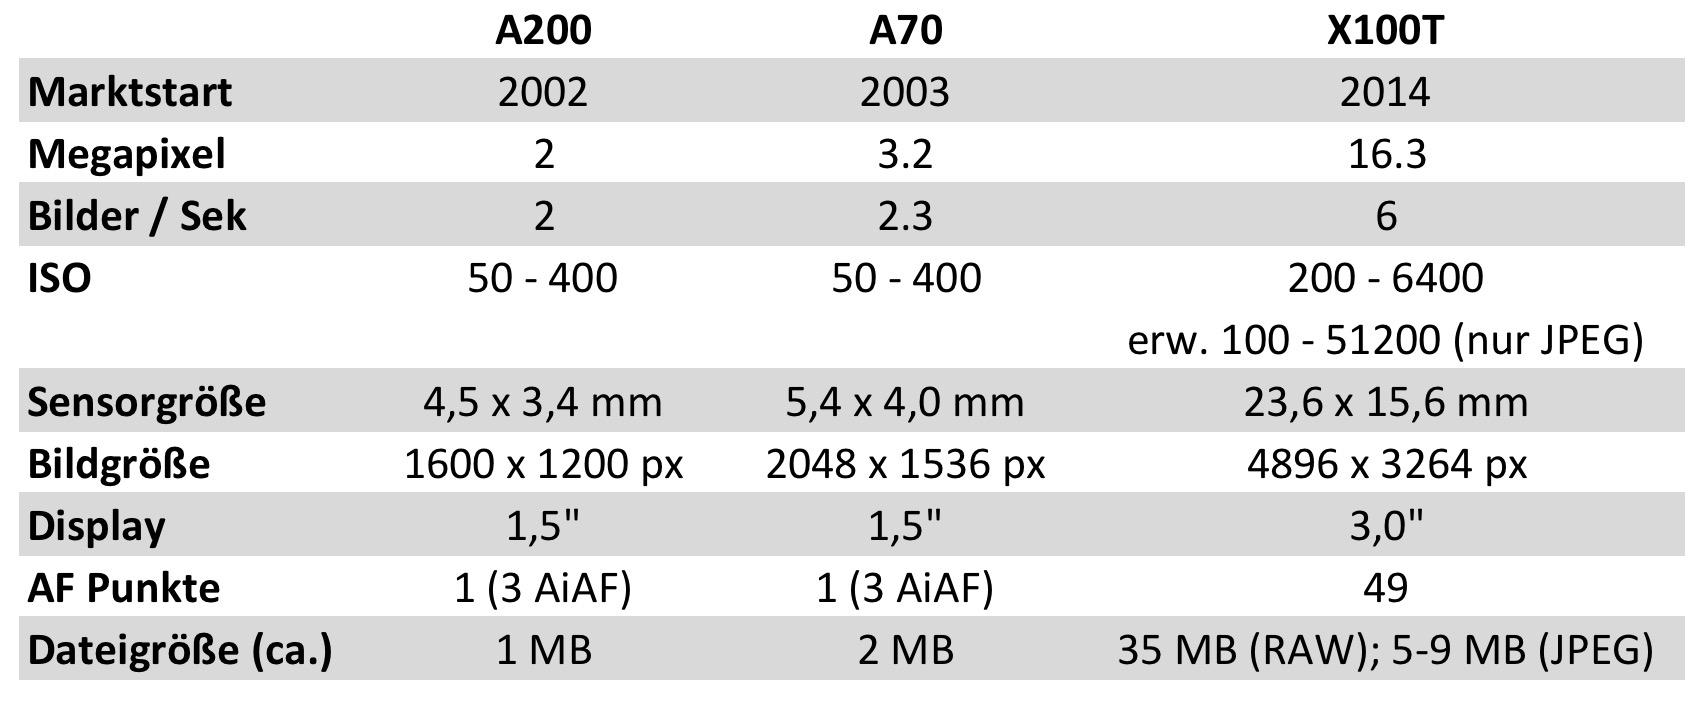 Vergleich Canon A200 & A70 mit der Fujifilm X100T